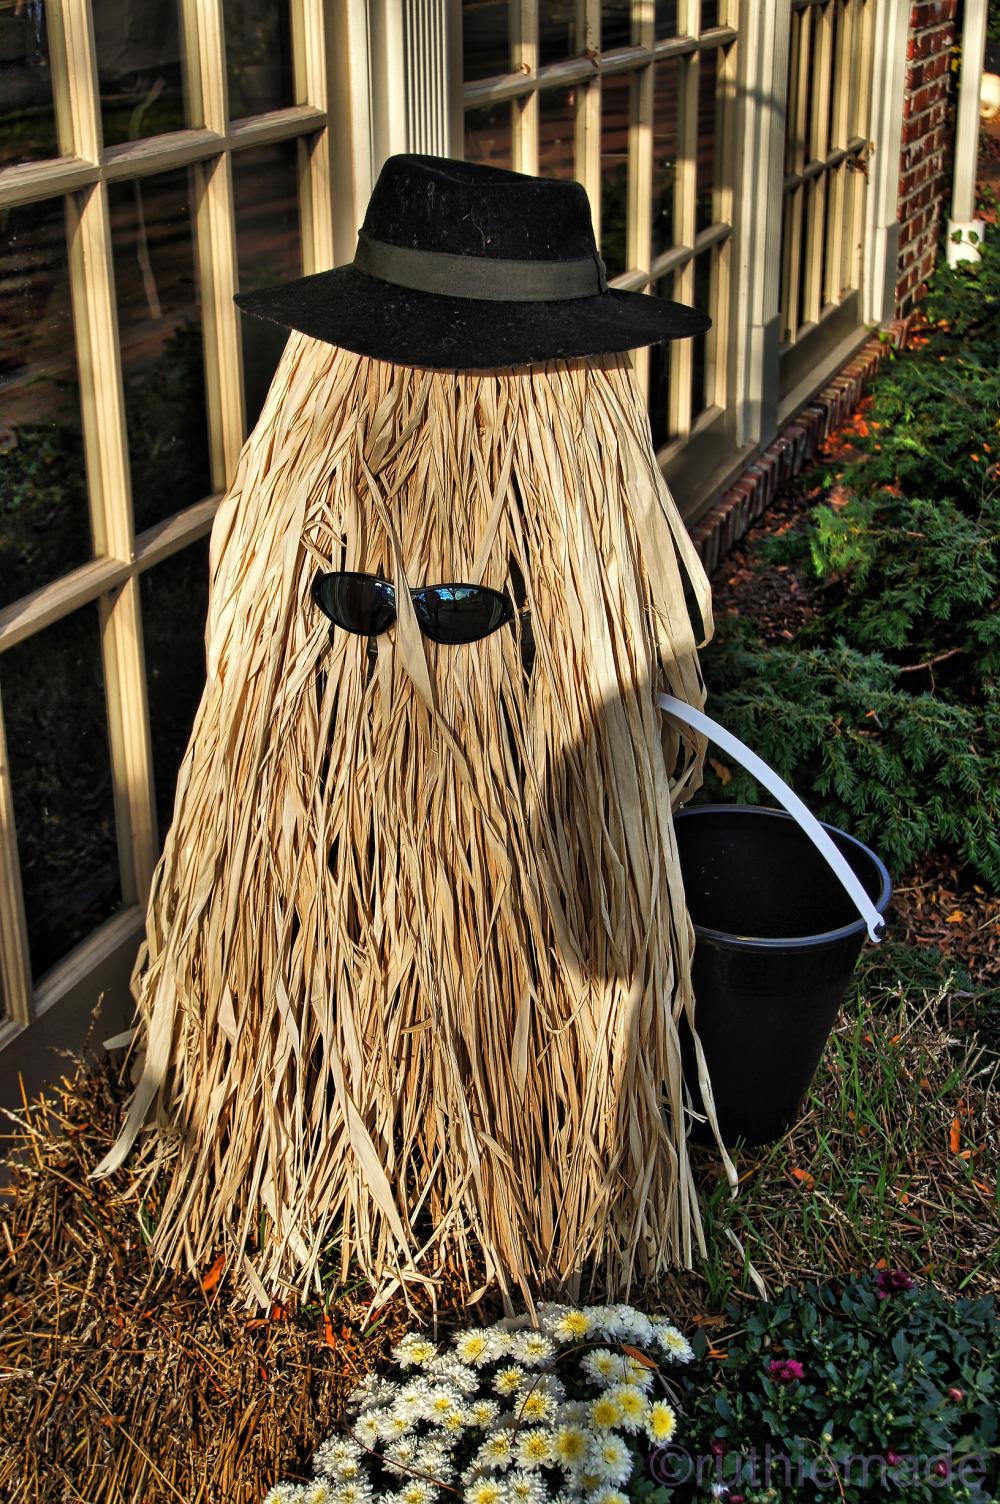 COusin Itt Scarecrow